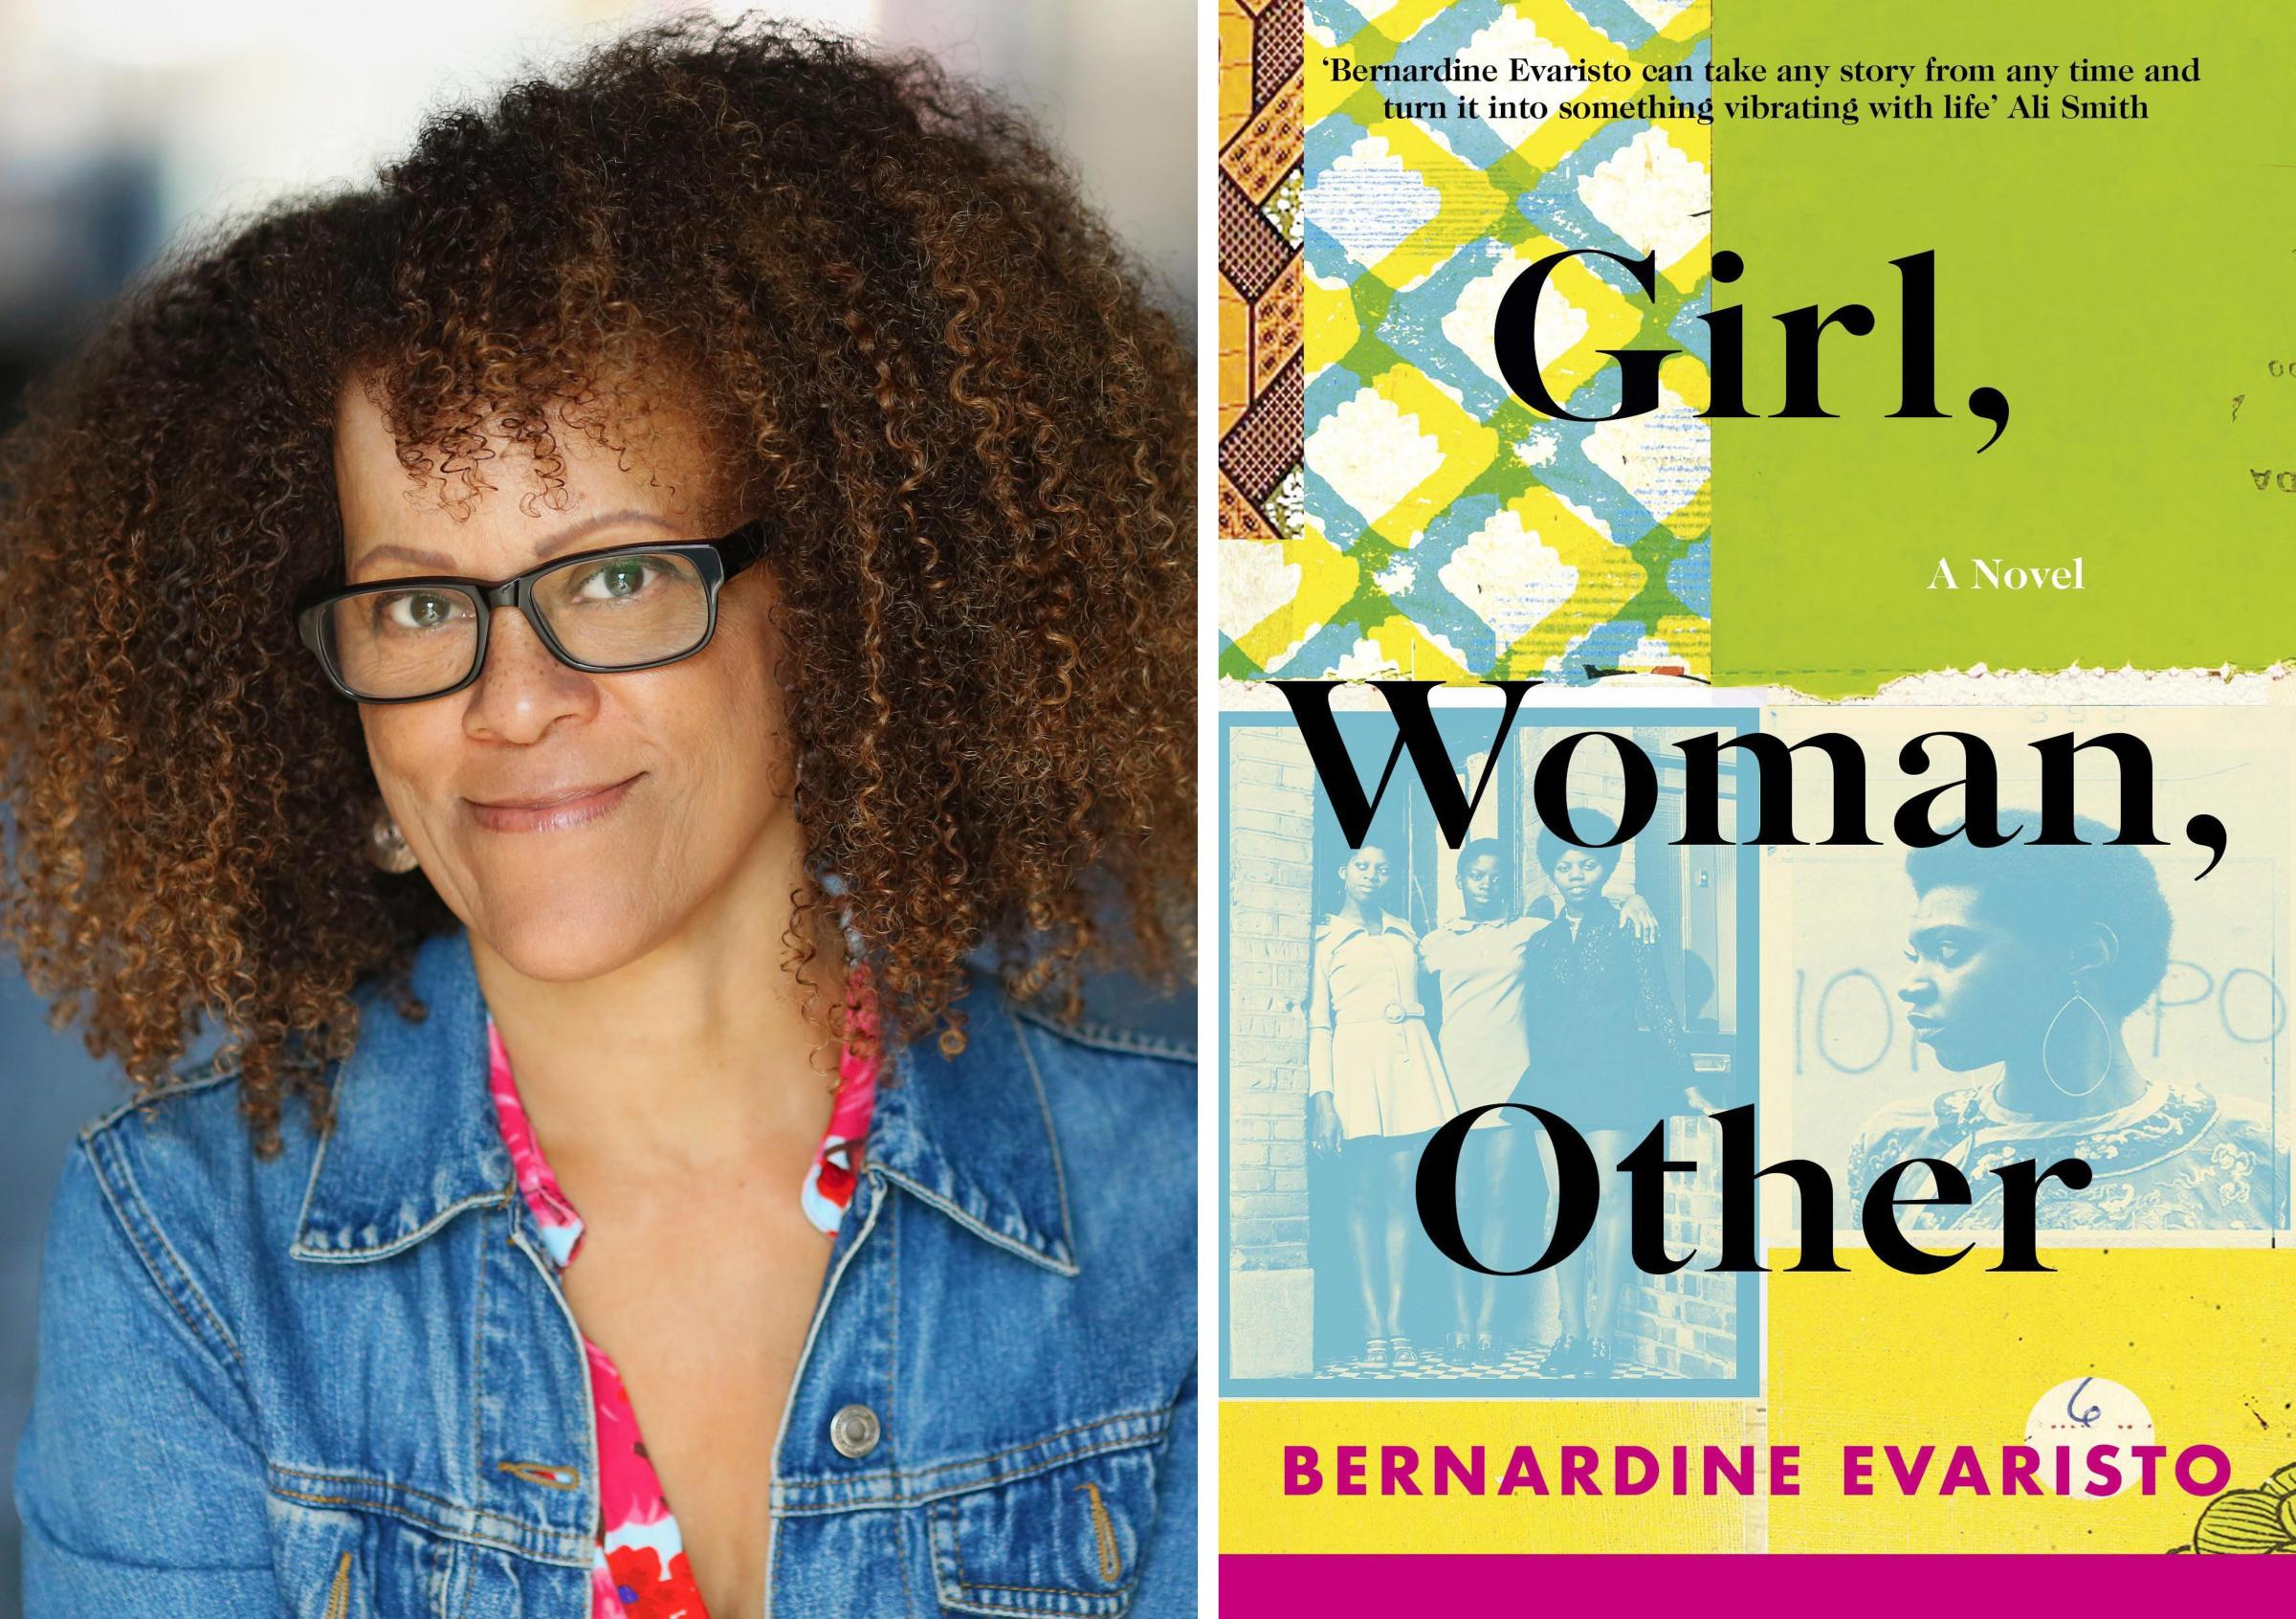 Booker prize winner Bernardine Evaristo to appear at Glasgow's Aye Write festival